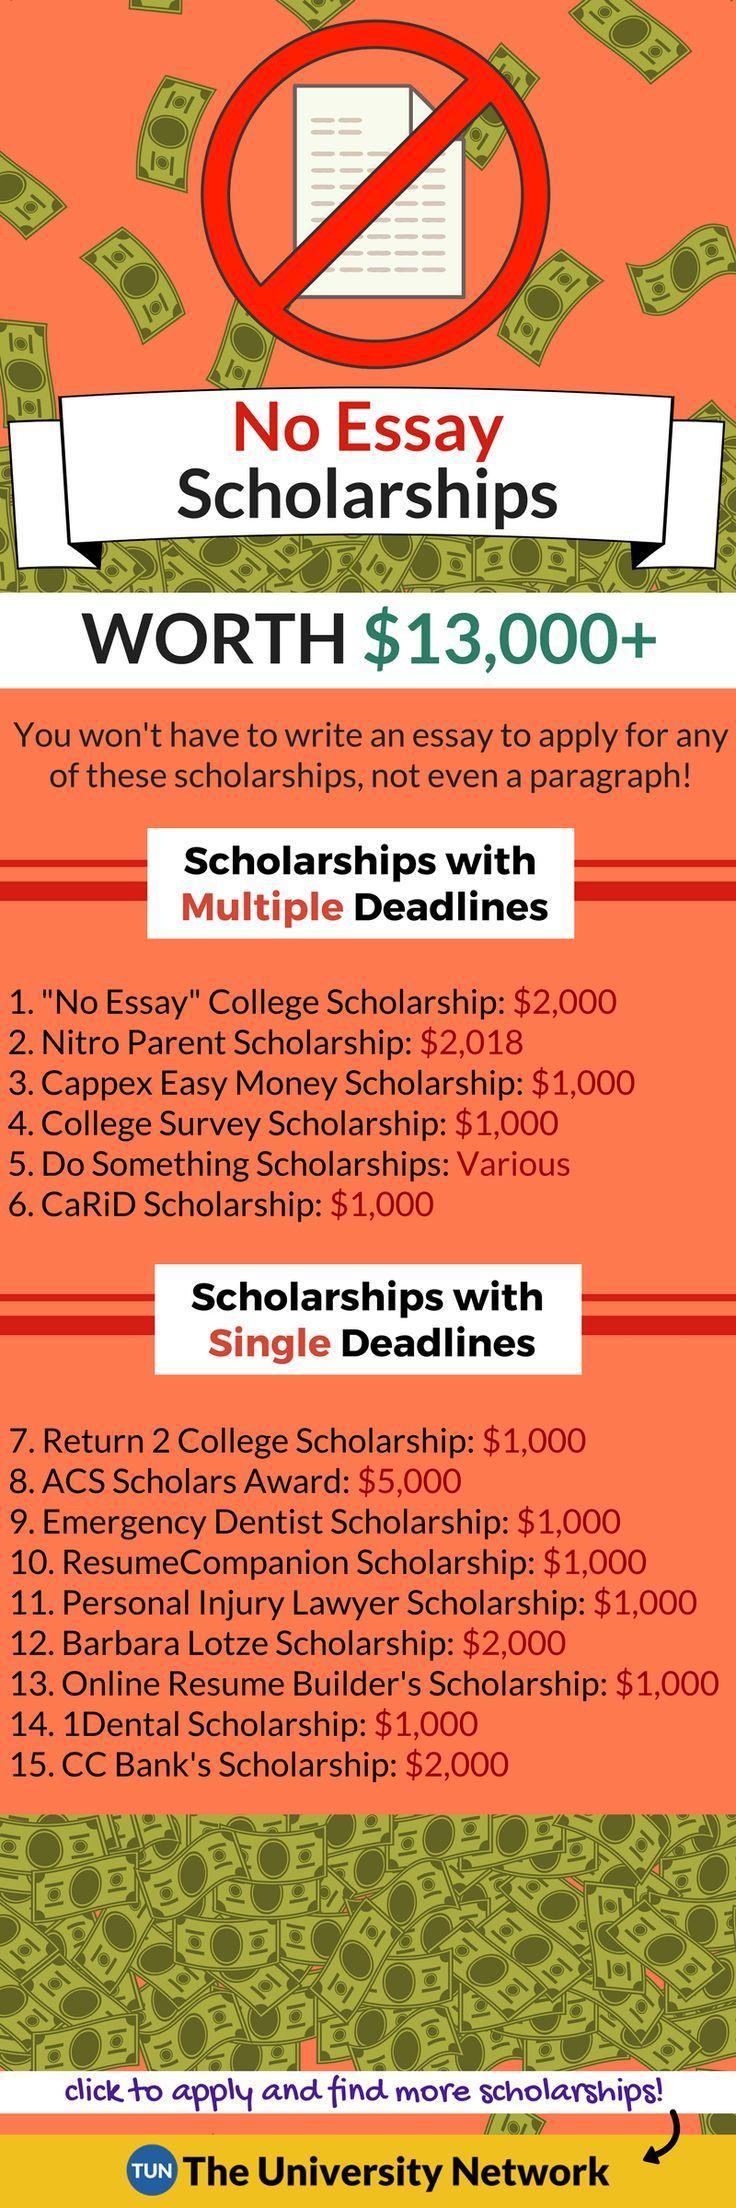 005 15 No Essay Scholarships Worth 30,000+ scholarships